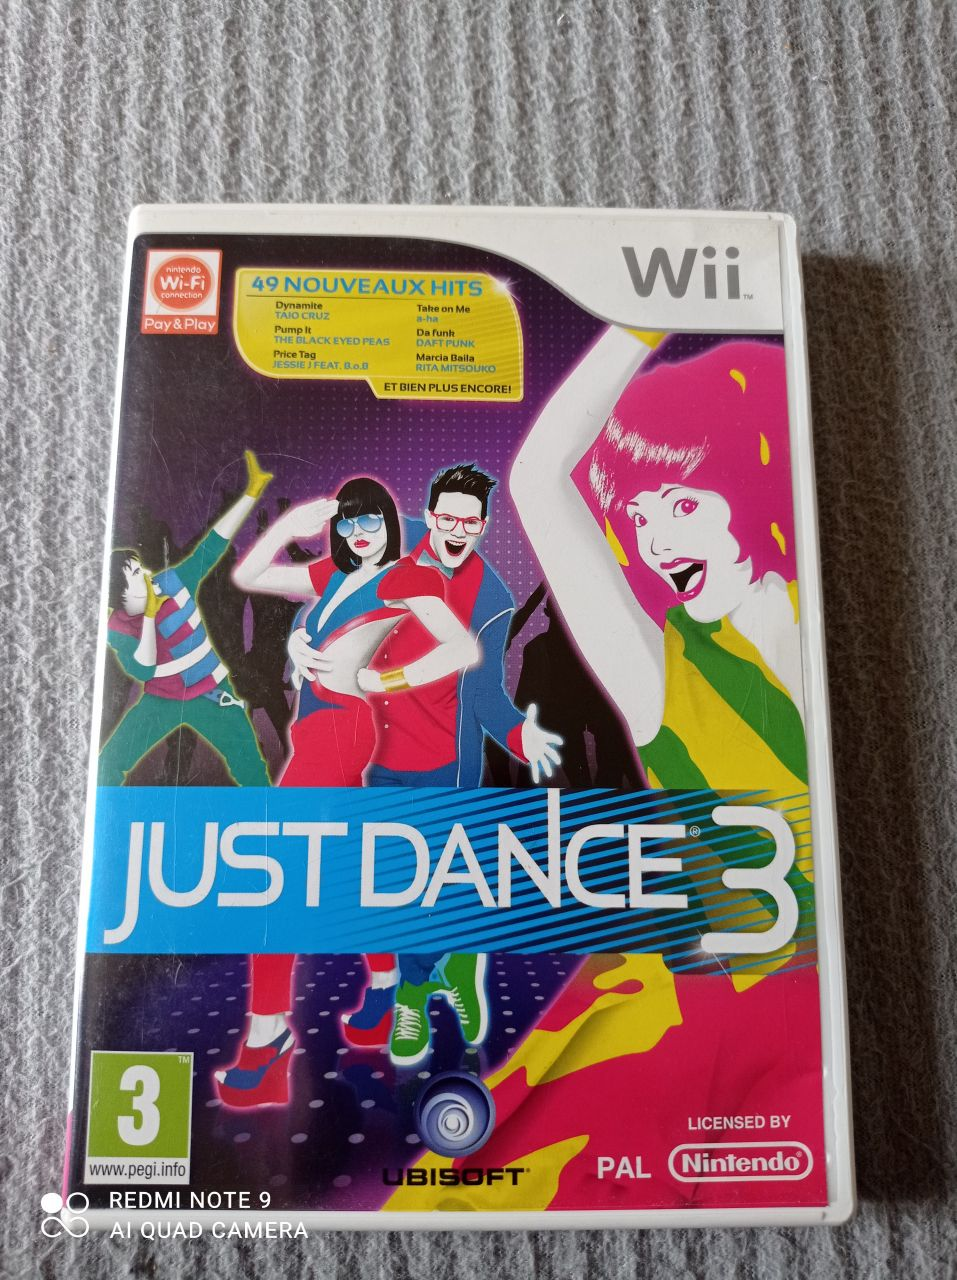 Image article Nintendo - Wii - Just dance 3